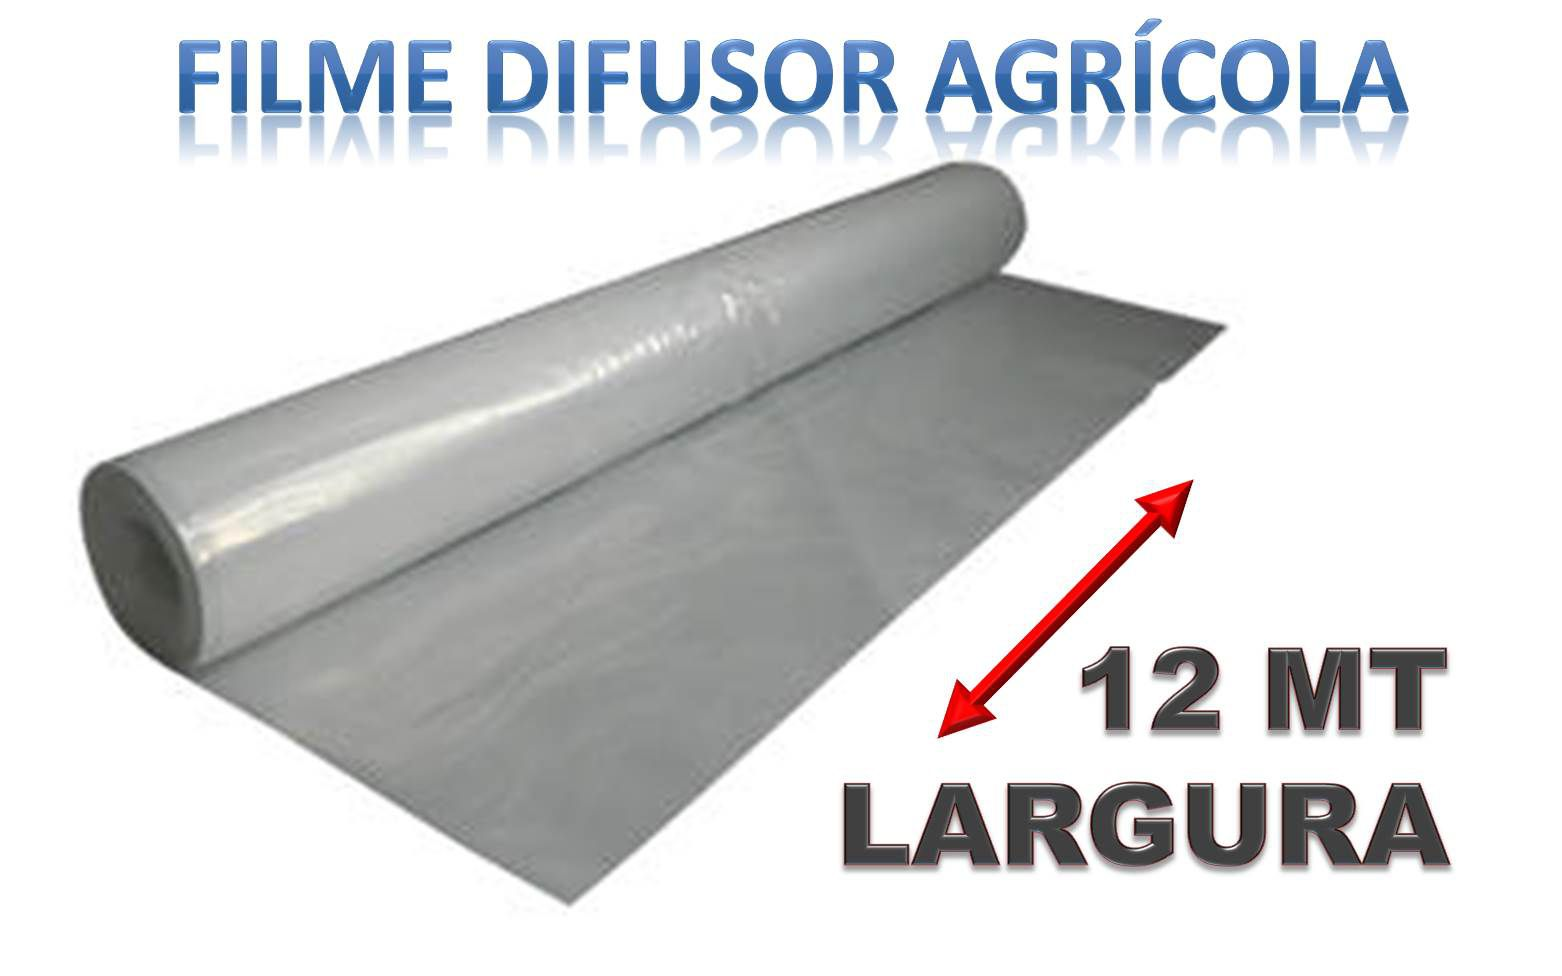 FILME DIFUSOR AGRICOLA  - 12 MT LARGURA